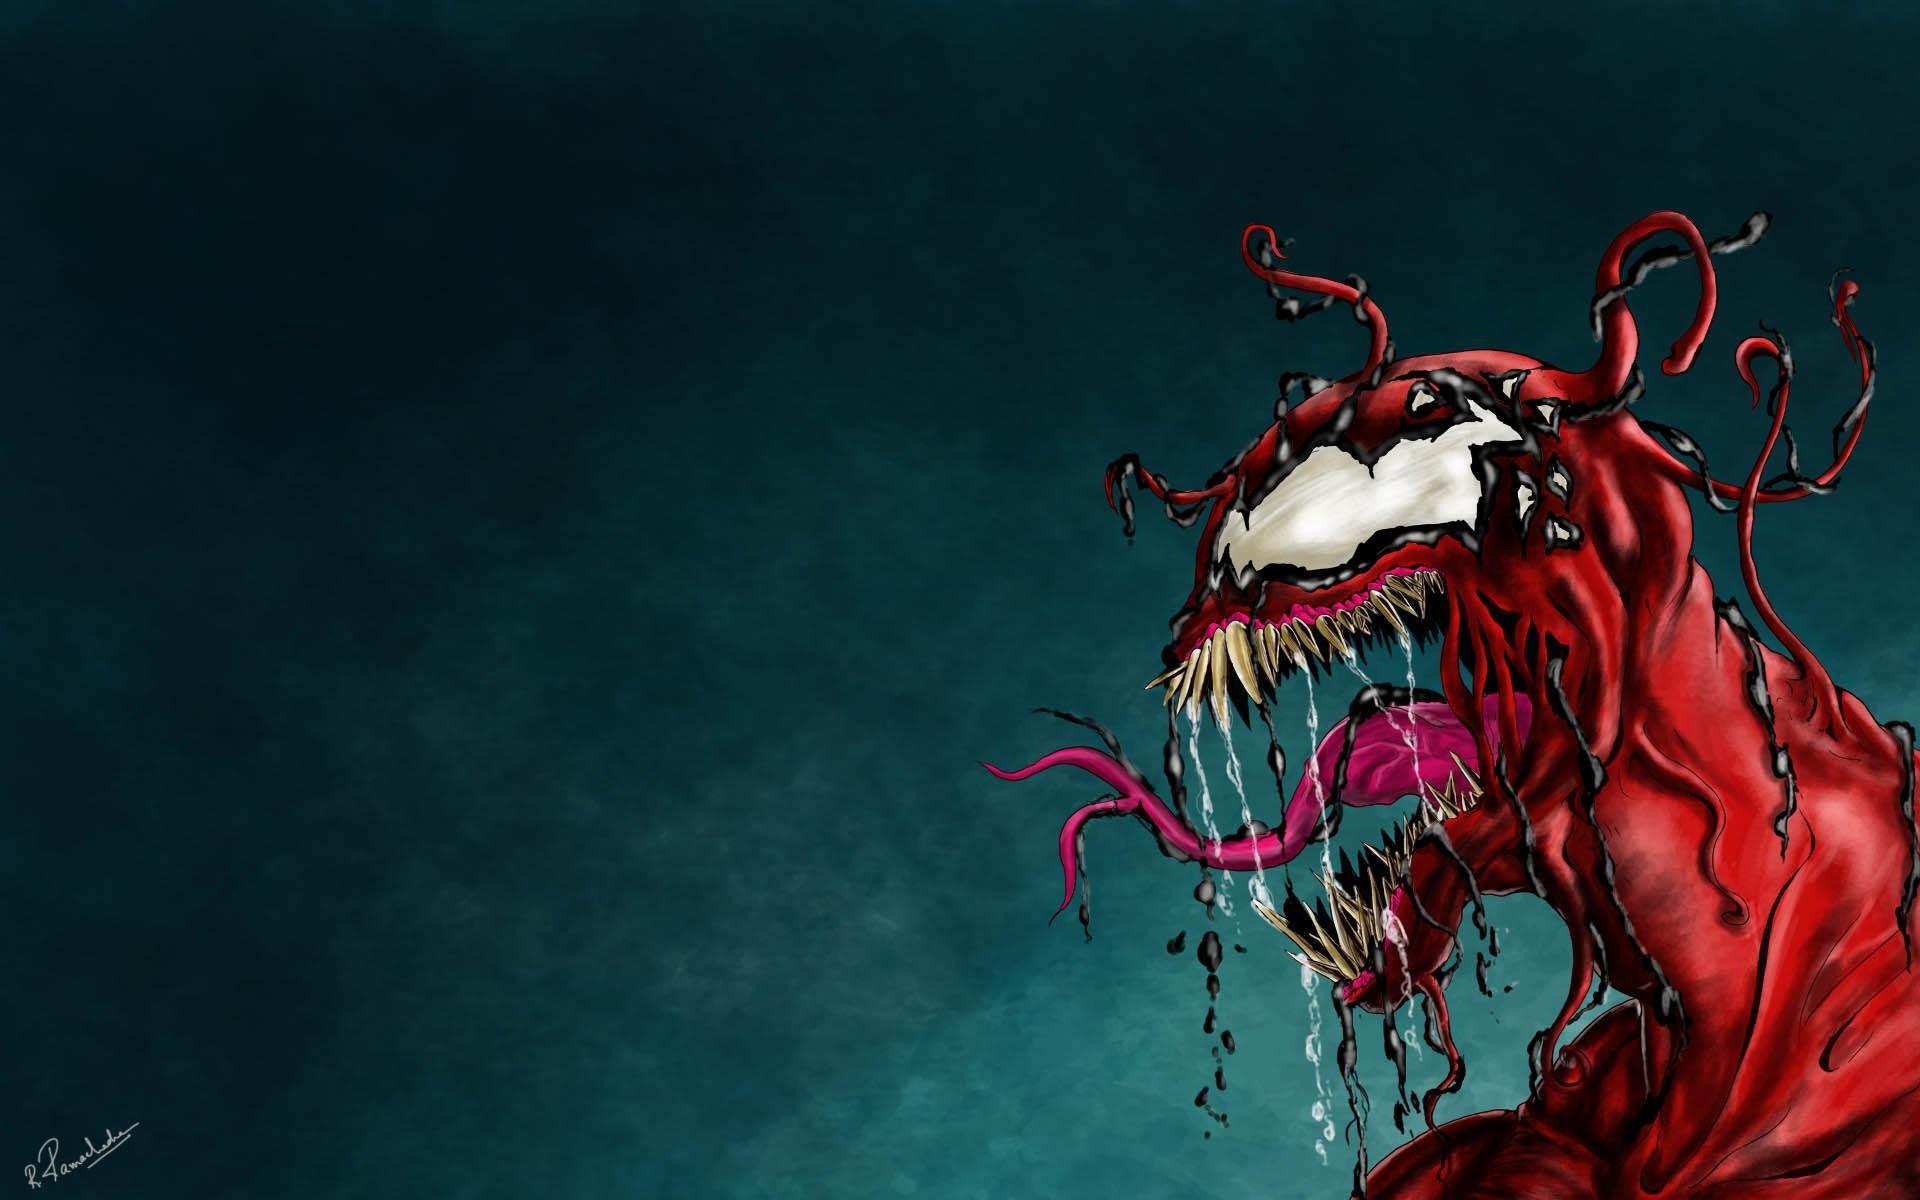 Spiderman Venom Carnage Wallpaper Images & Pictures – Becuo